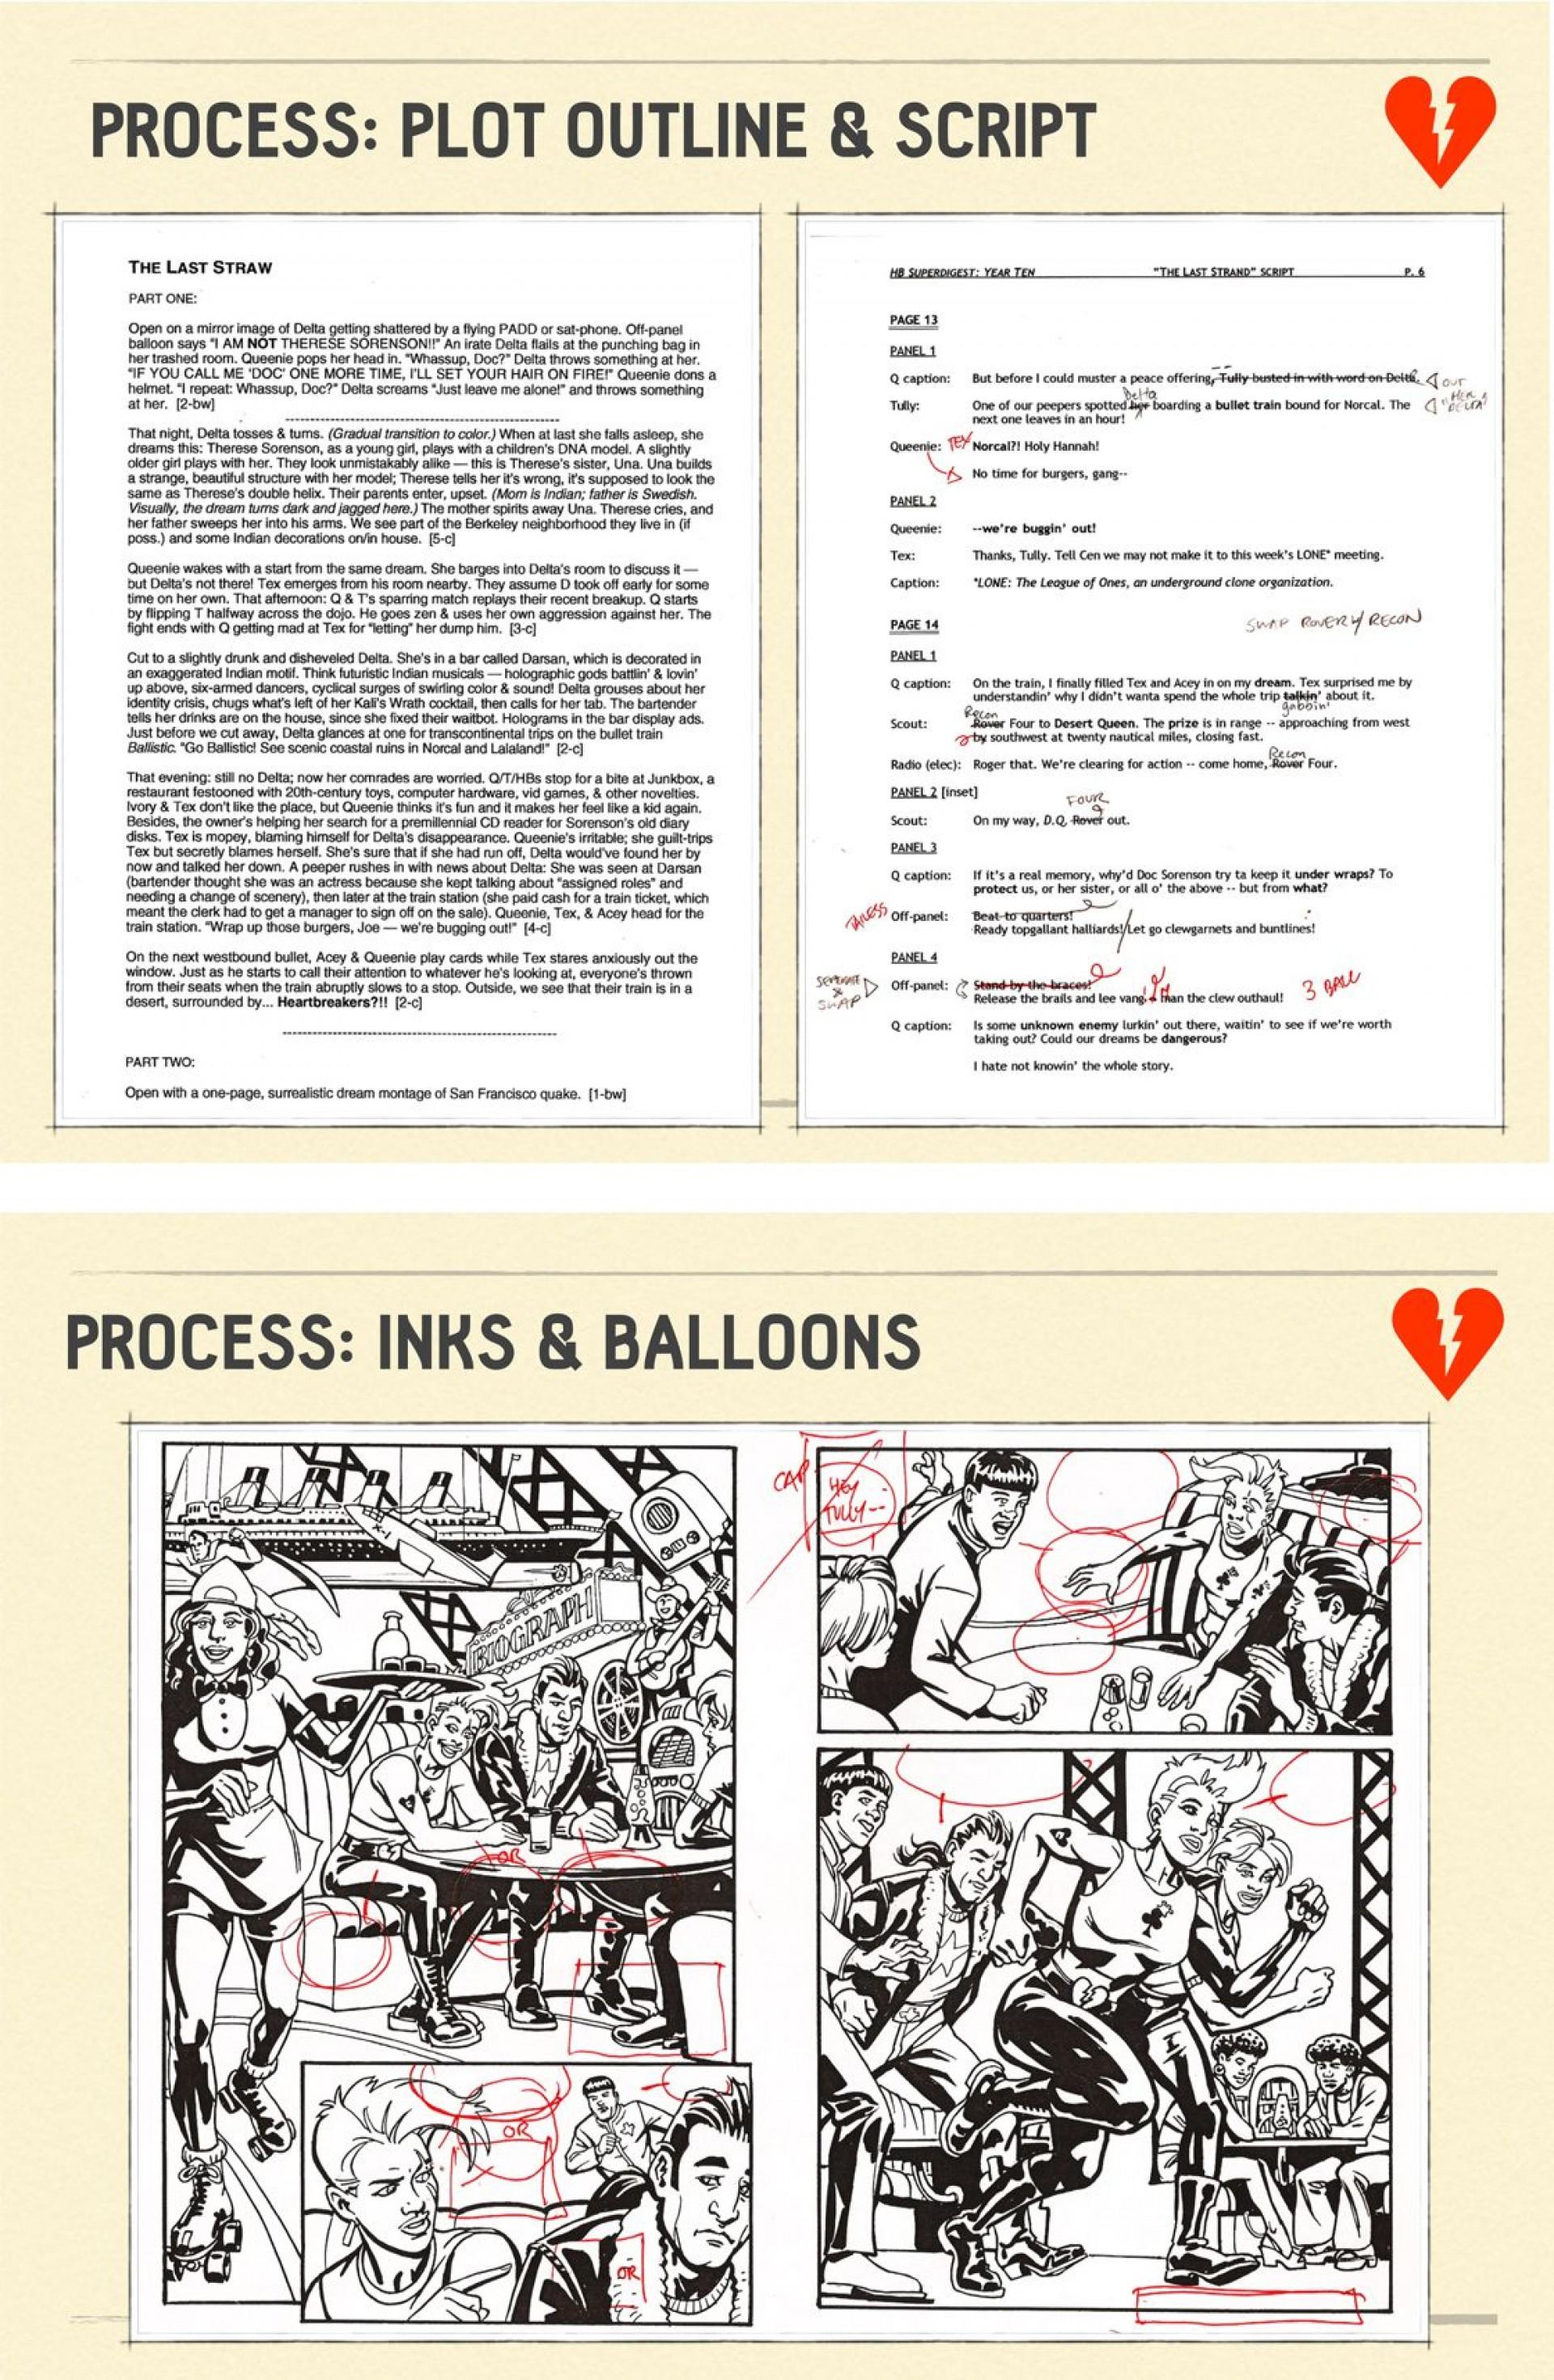 005 Dreaded Comic Book Script Sample Image  Marvel Celtx1920